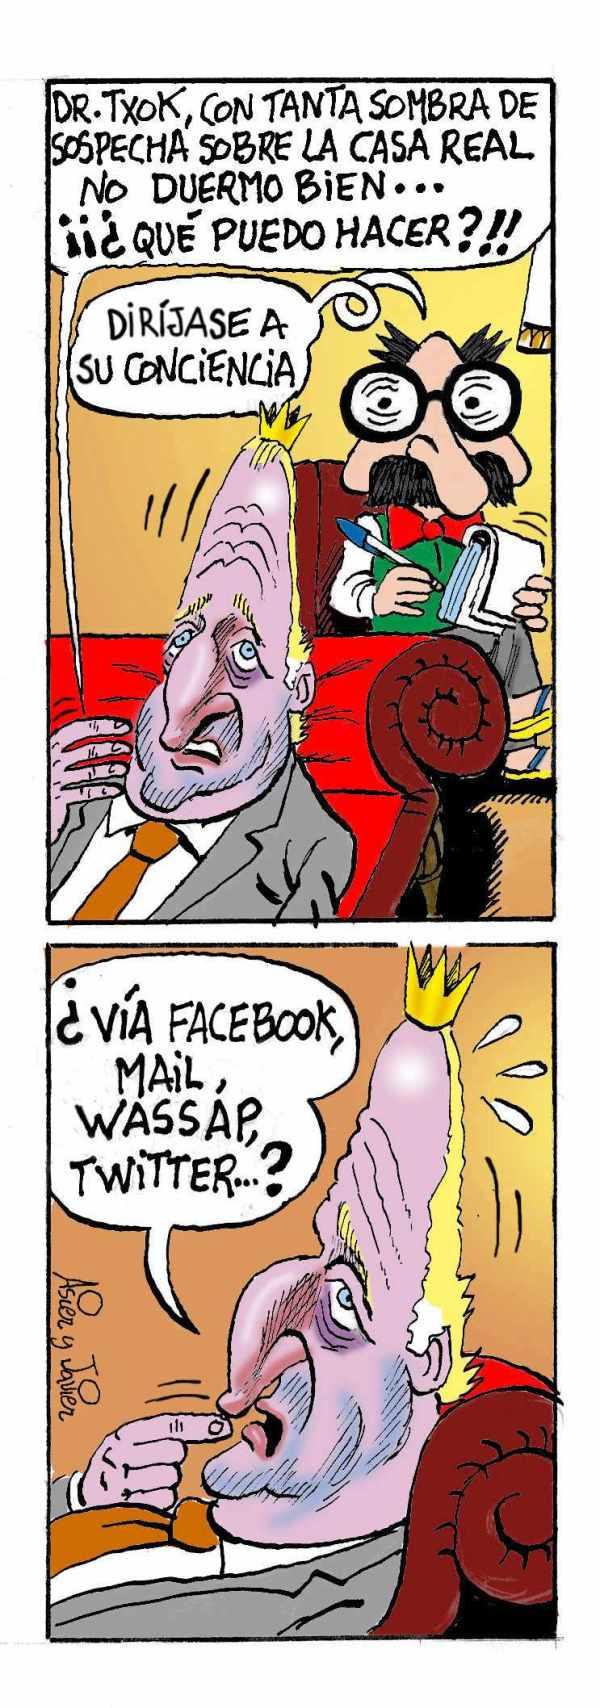 Rey, Juan Carlos, Borbón, Casa Real, Caricatura, Doctor Txok